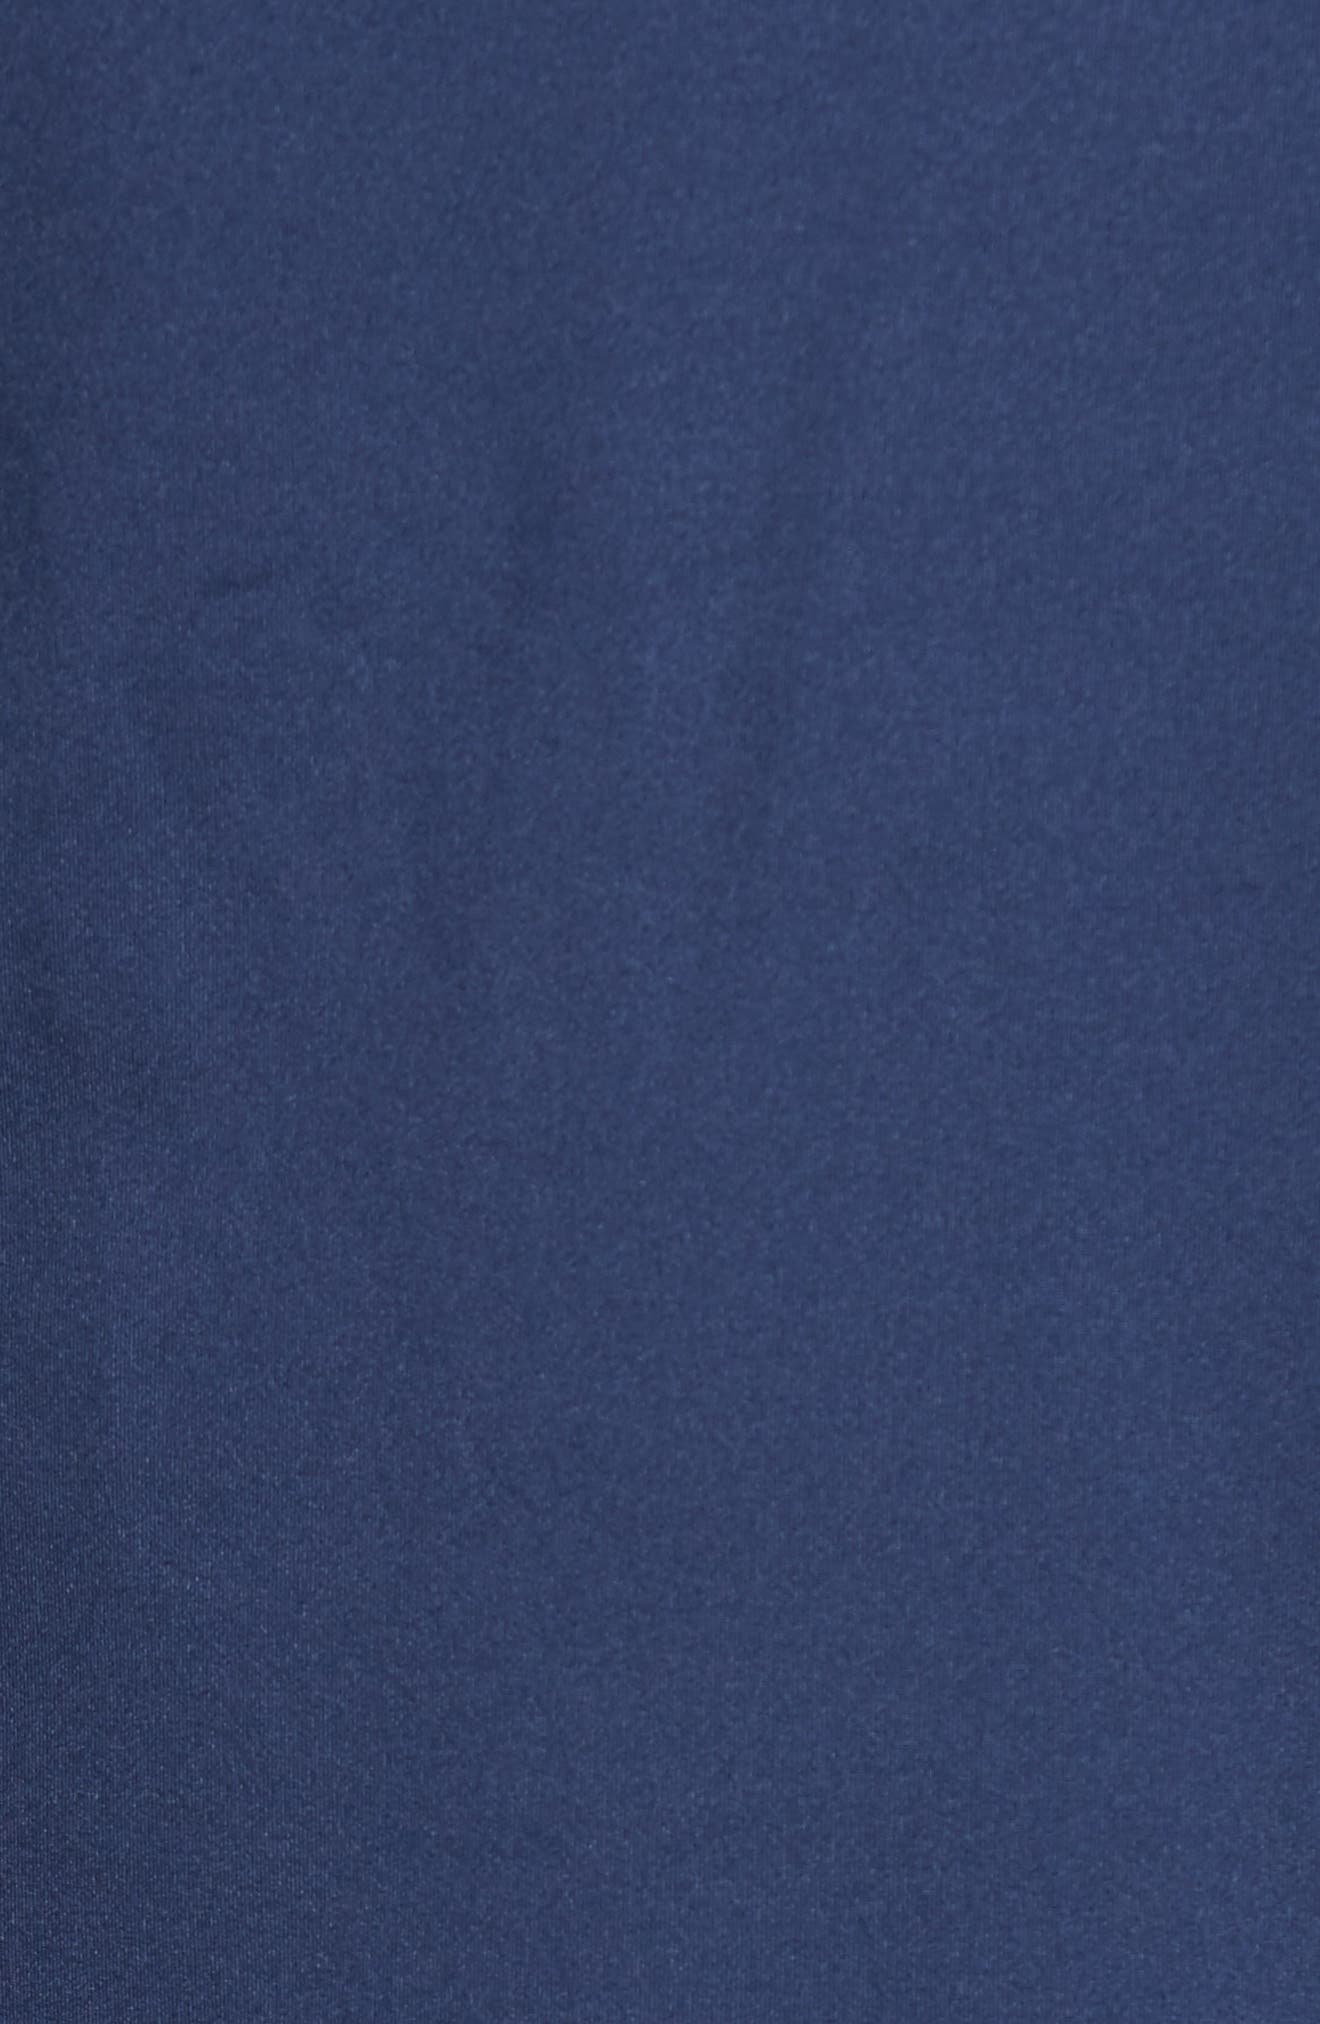 Surf Chaser Crewneck T-Shirt,                             Alternate thumbnail 14, color,